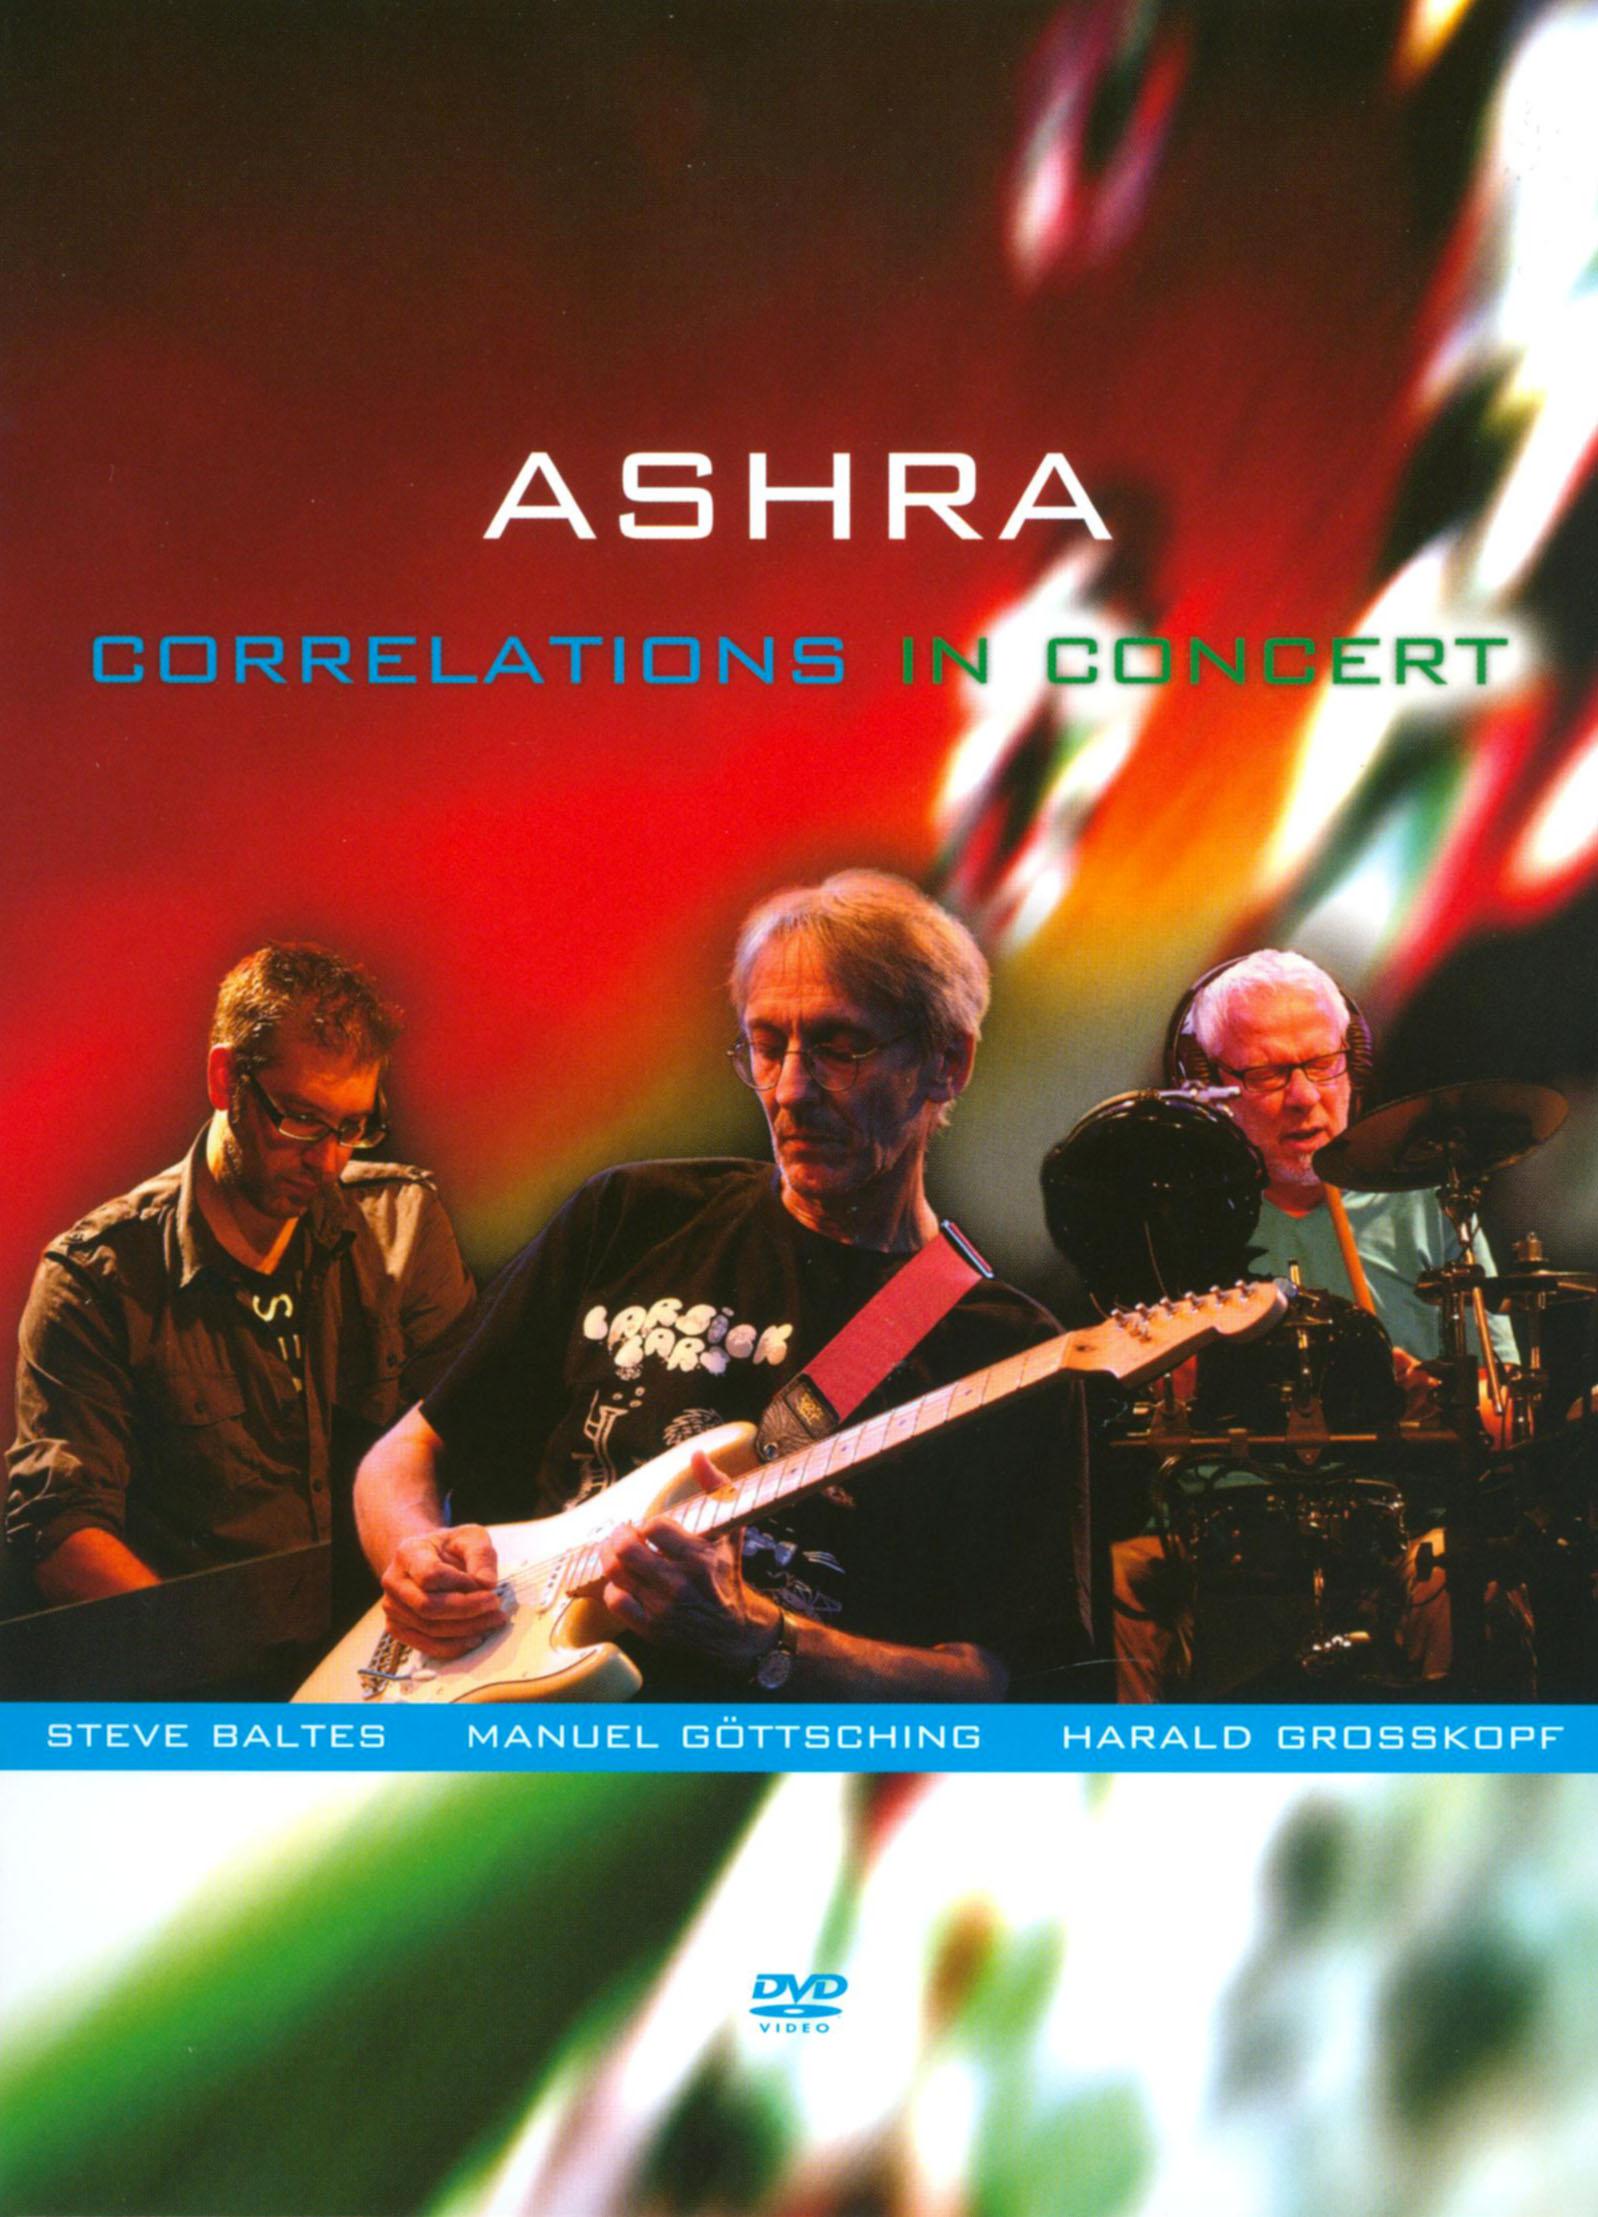 Ashra: Correlations in Concert